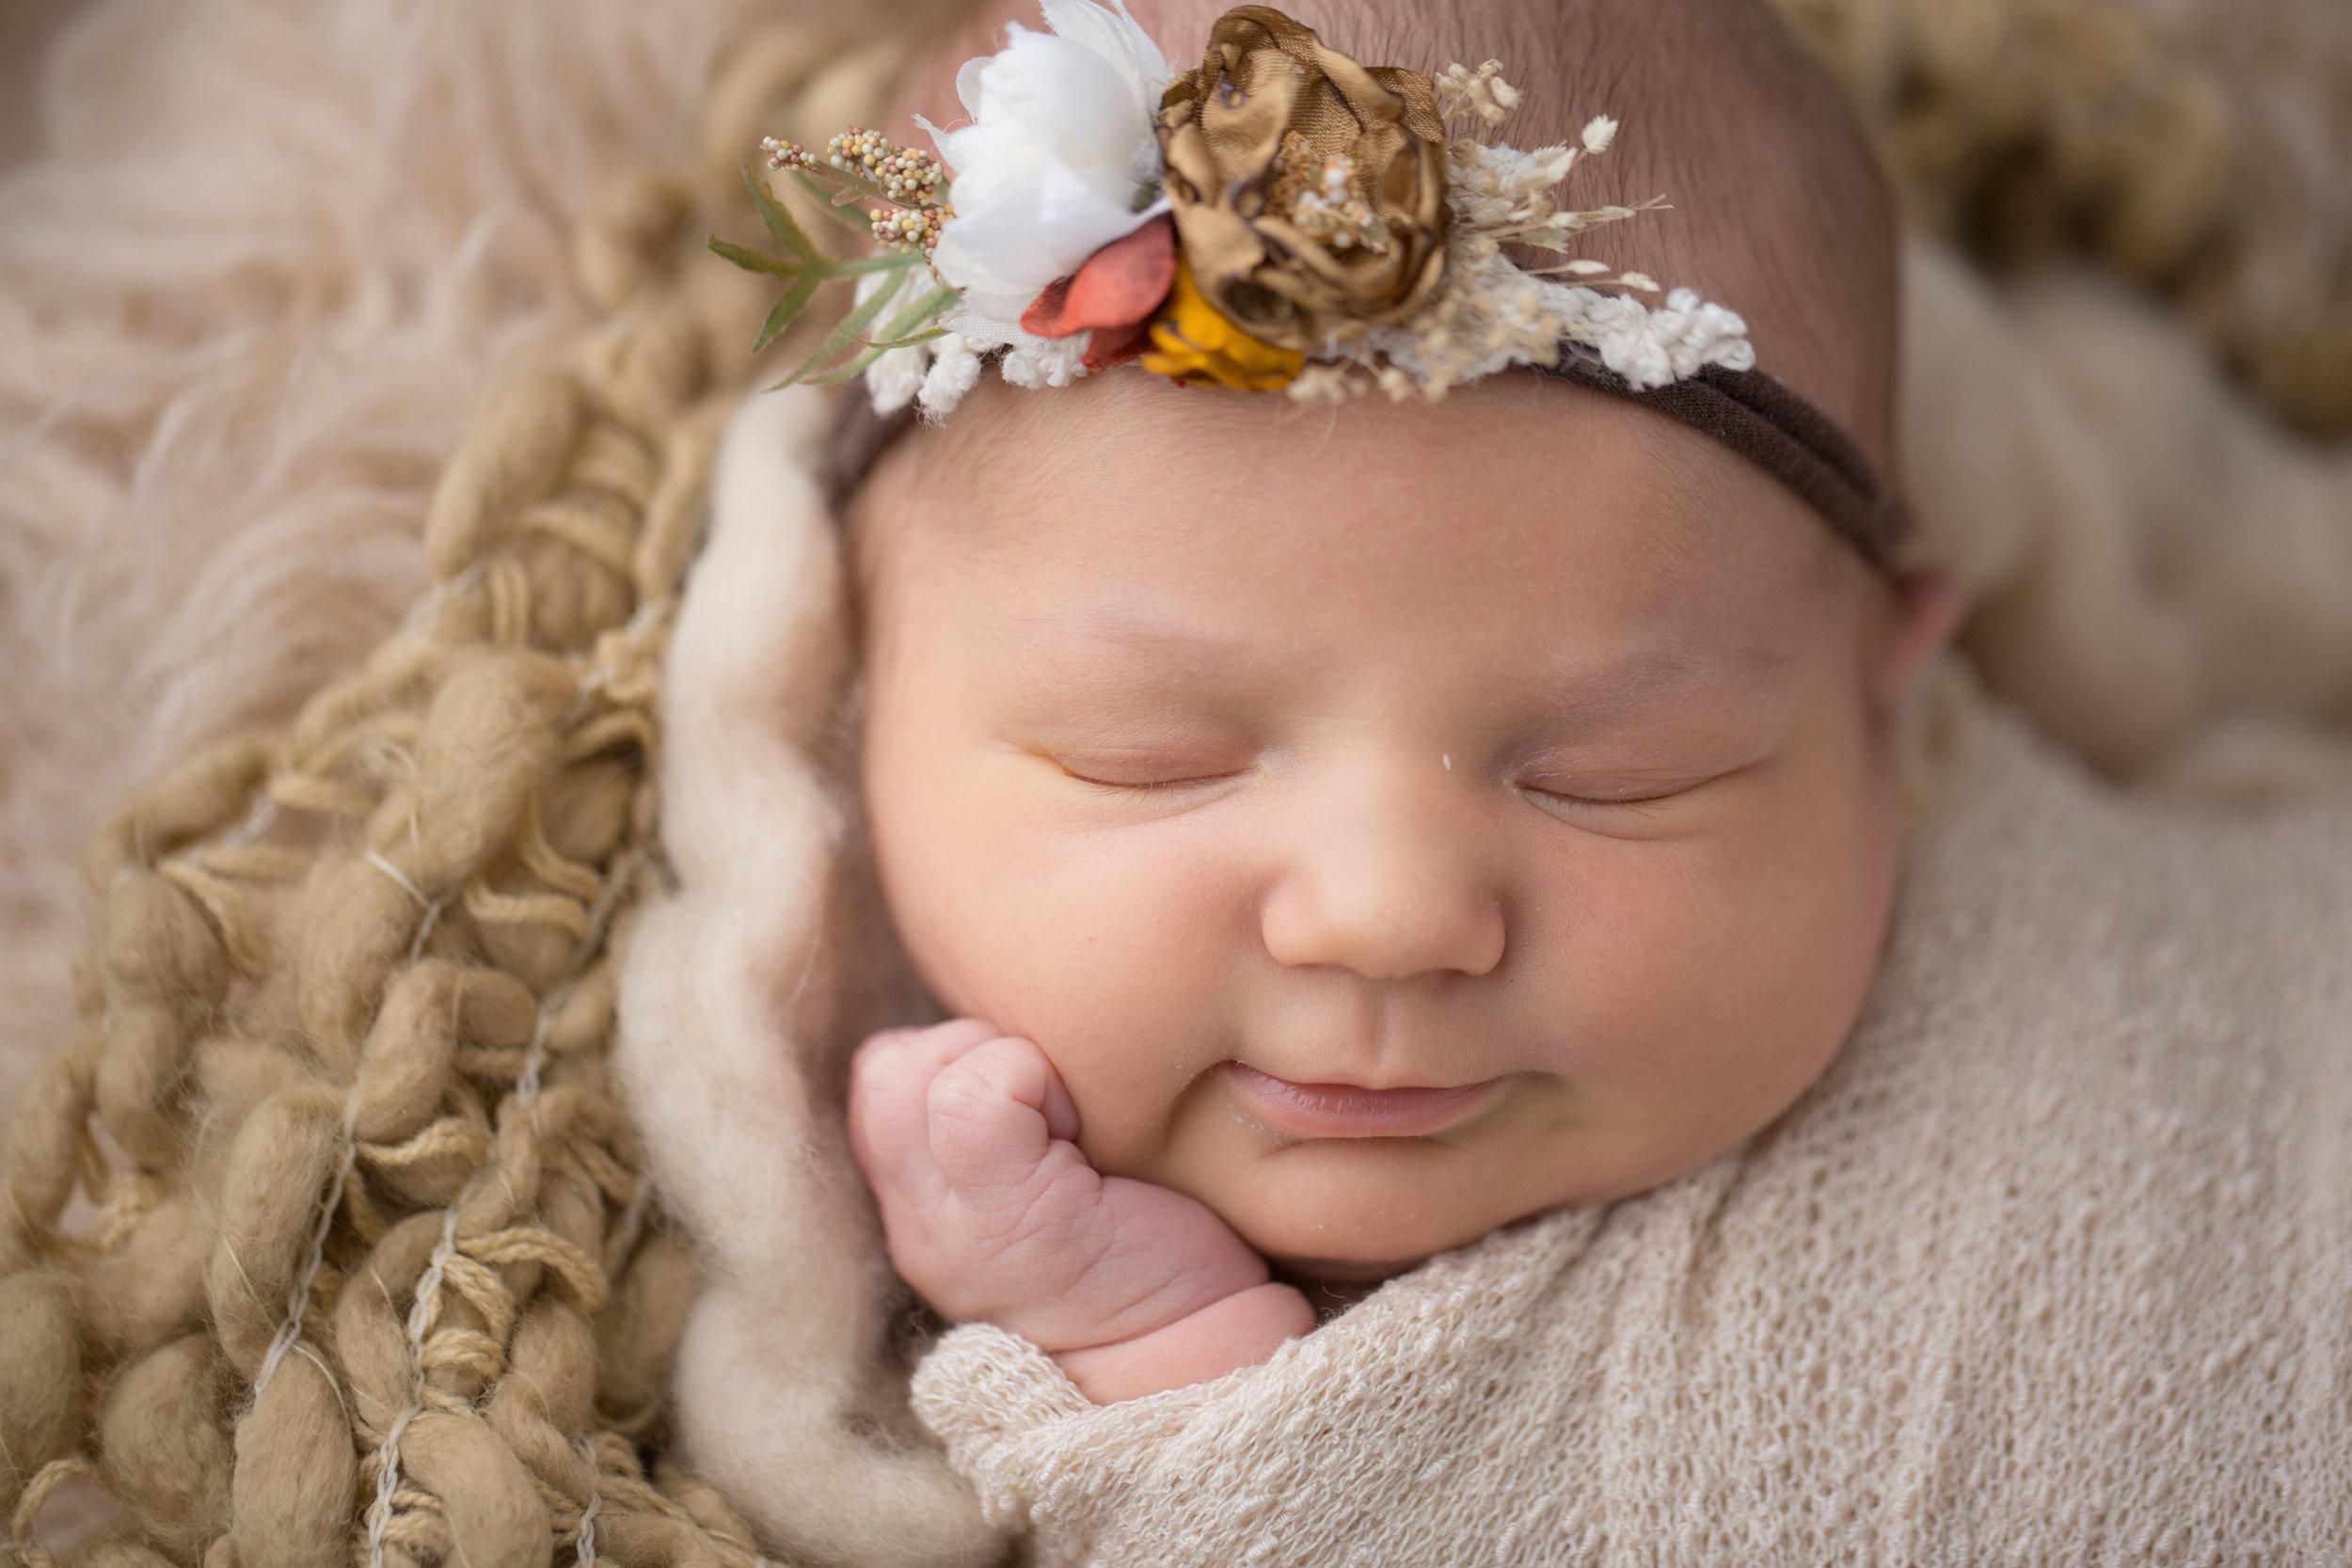 Cute baby girl with chunky cheeks in newborn photos